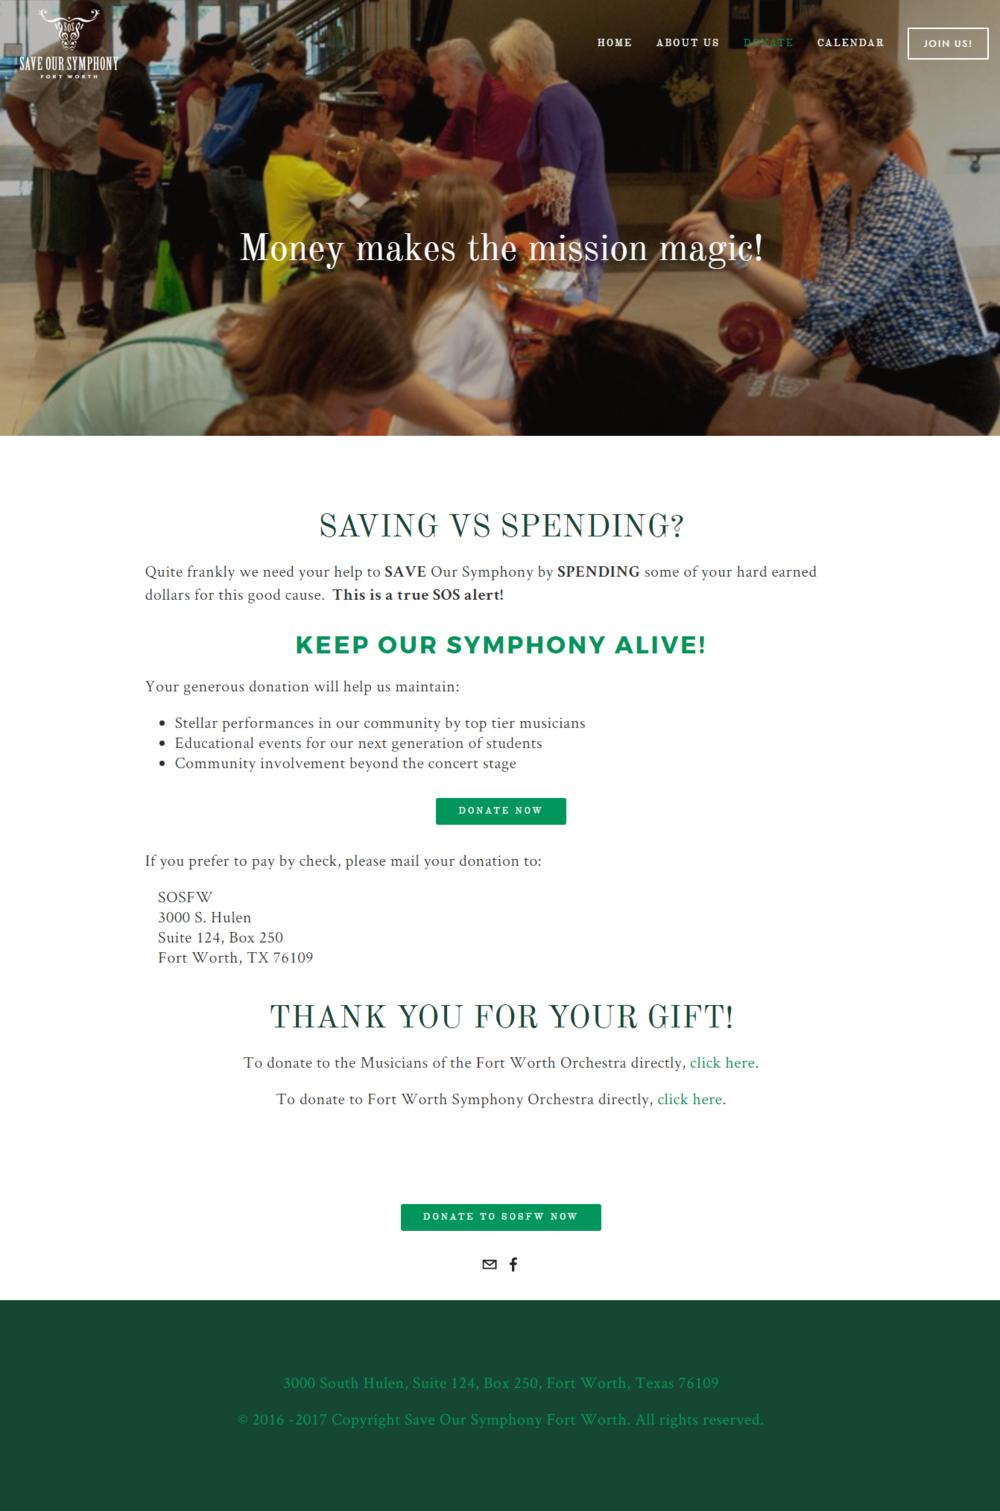 screenshot-www.sosfw.org 2017-02-24 15-16-29.png